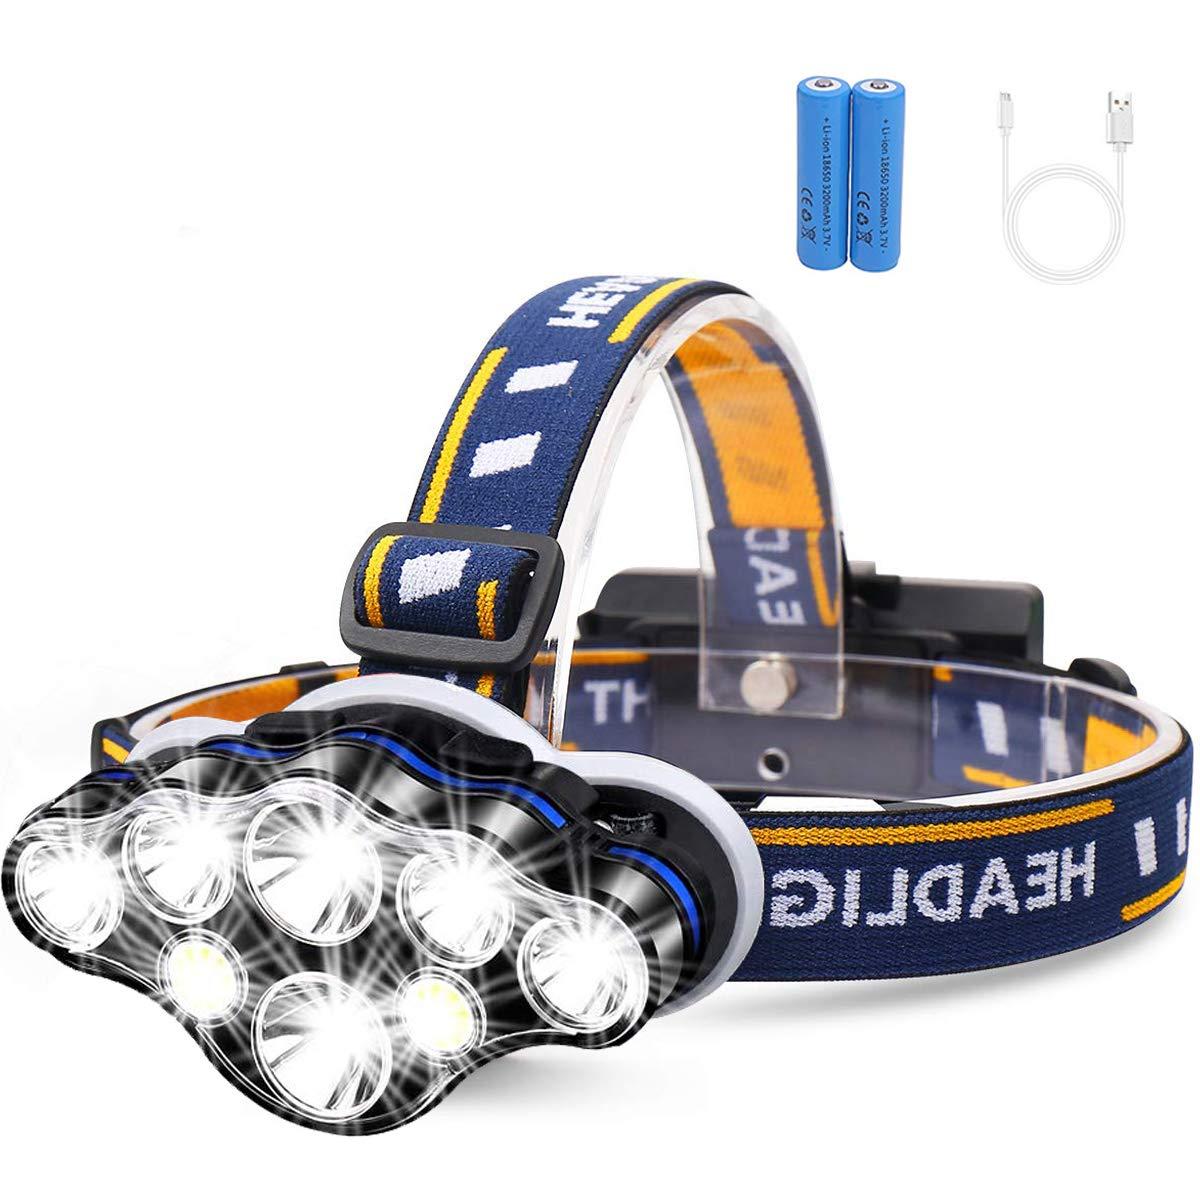 8 LED USB Rechargeable Headlamp